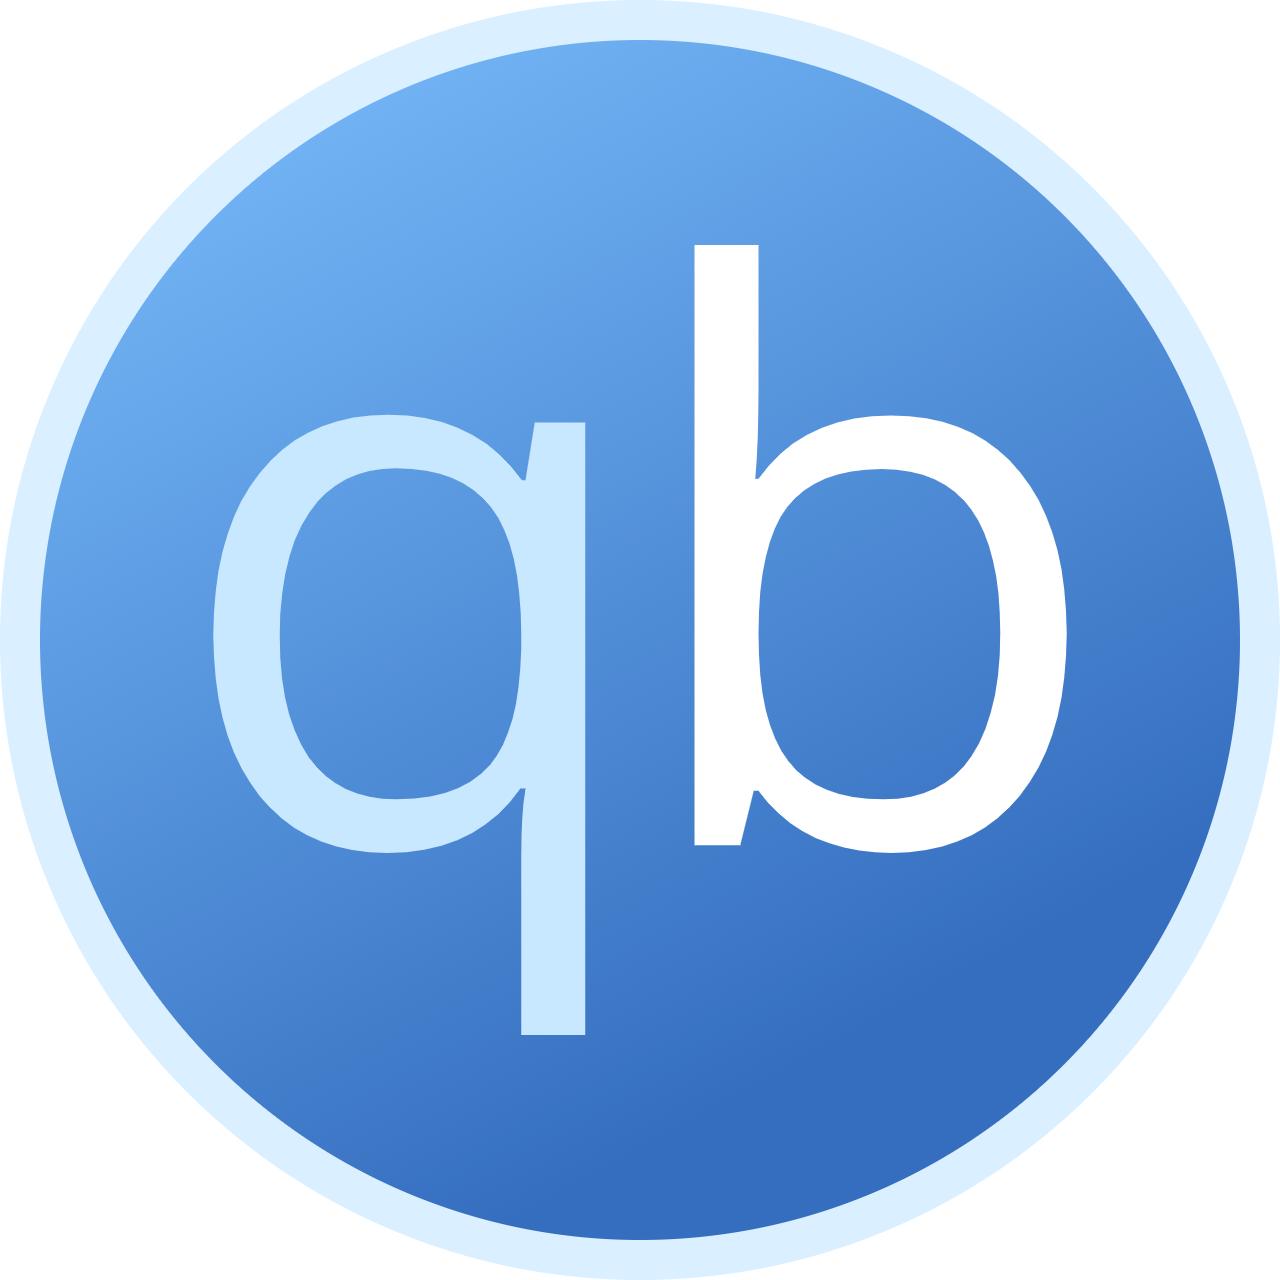 BT 下载利器 qBittorrent 最新中文绿色增强版